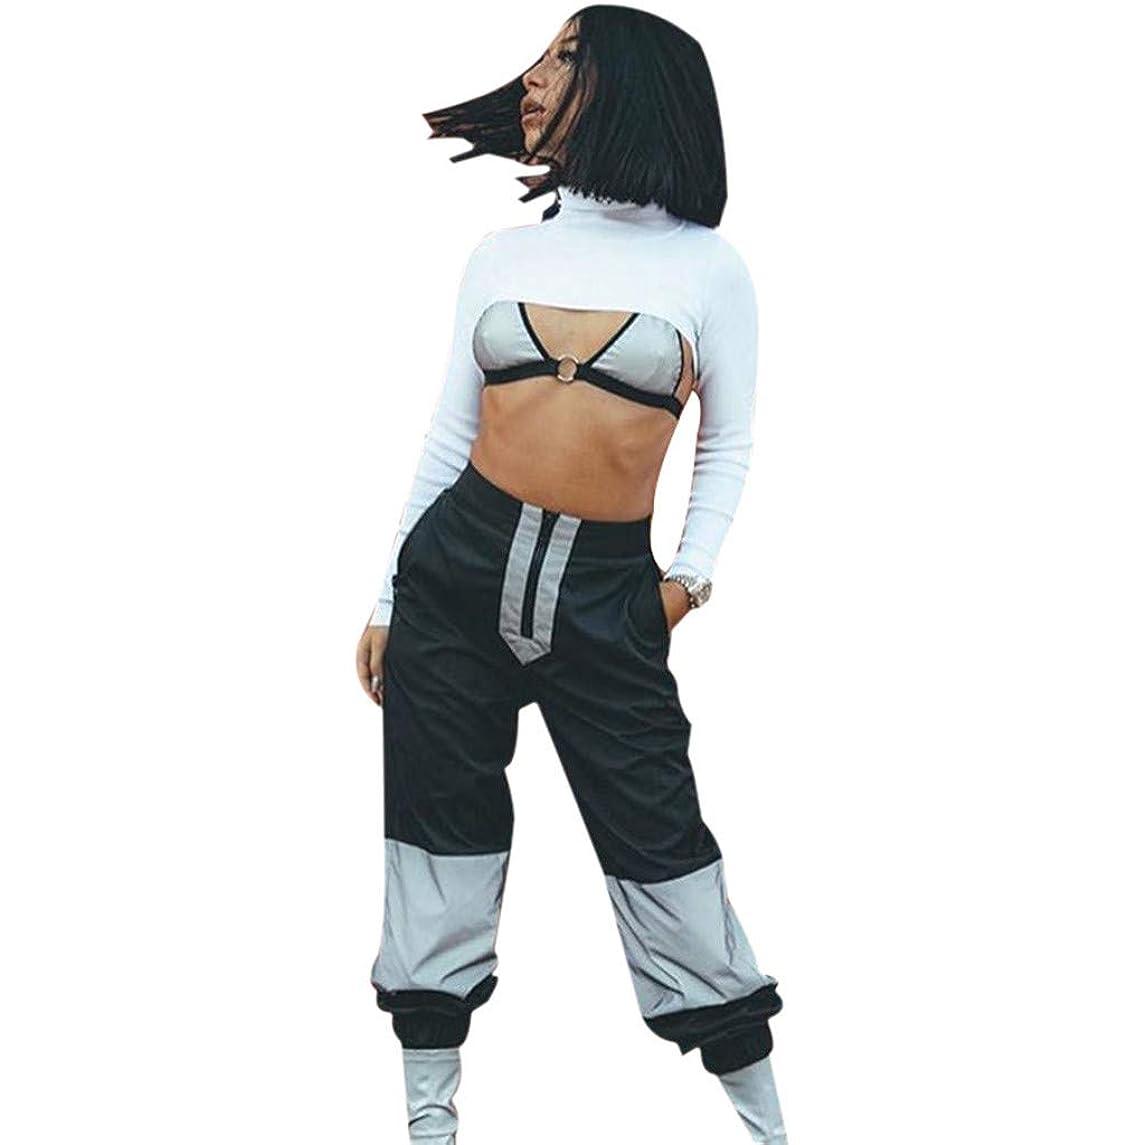 Kanzd Women Pants Night Reflective Trousers Hip Hop Womens High Waist Pants Joggers Loose Pant